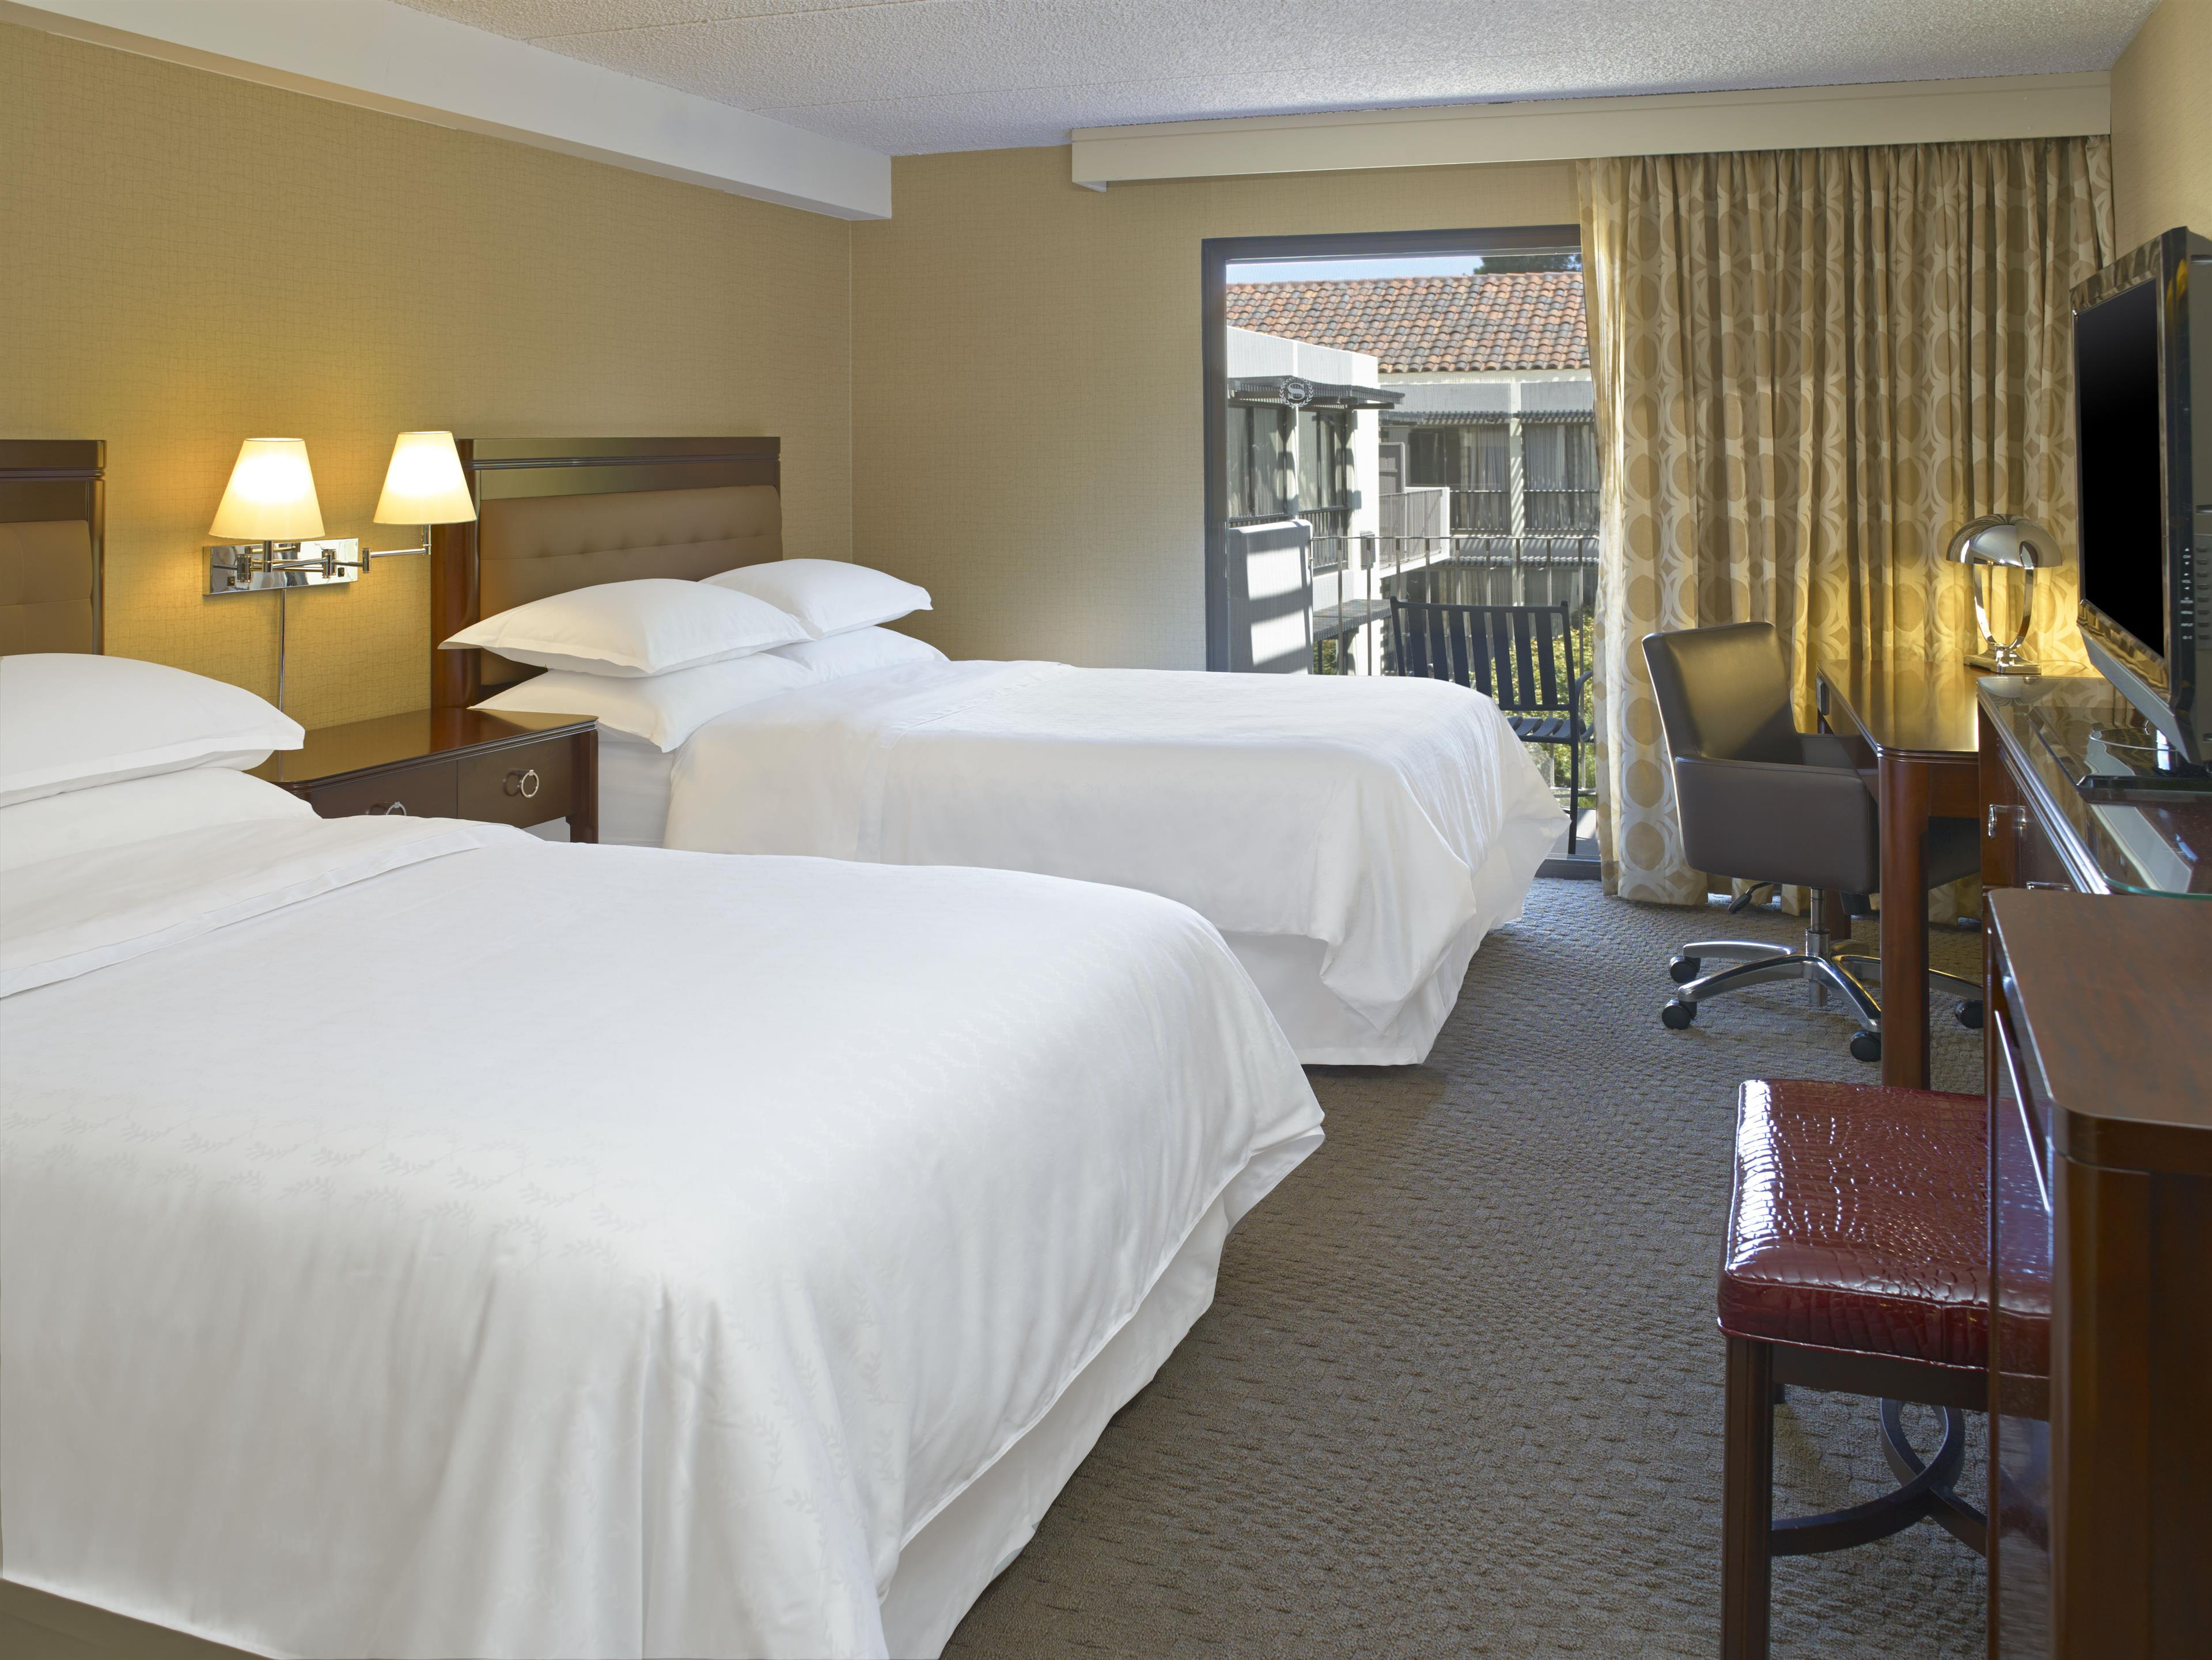 Sheraton Palo Alto Hotel image 1